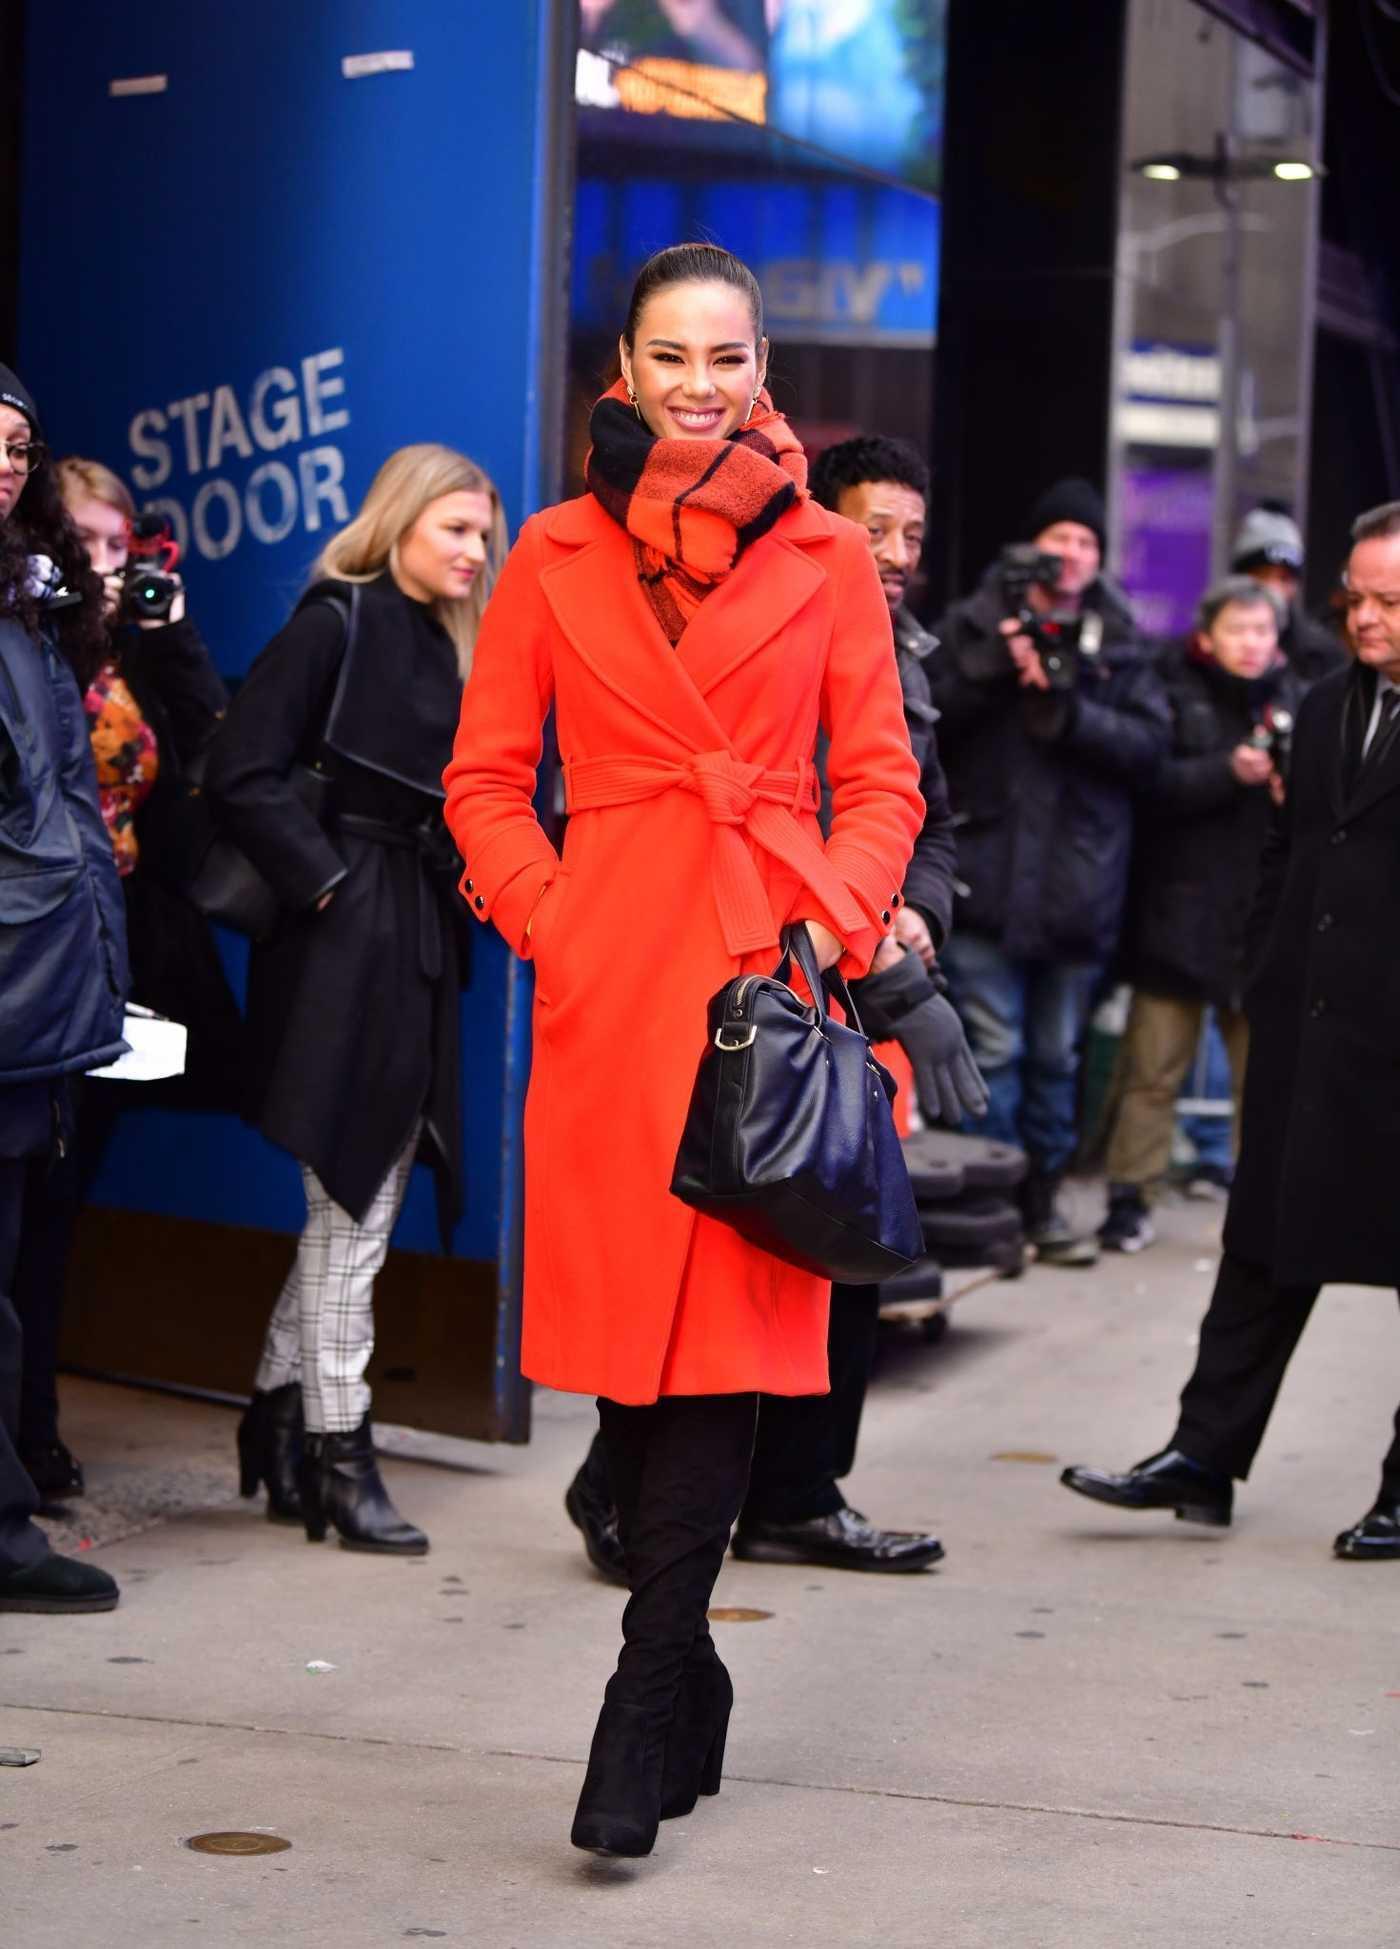 Catriona Gray in a Red Coat Leaves Good Morning America Studios in New York City 01/07/2019